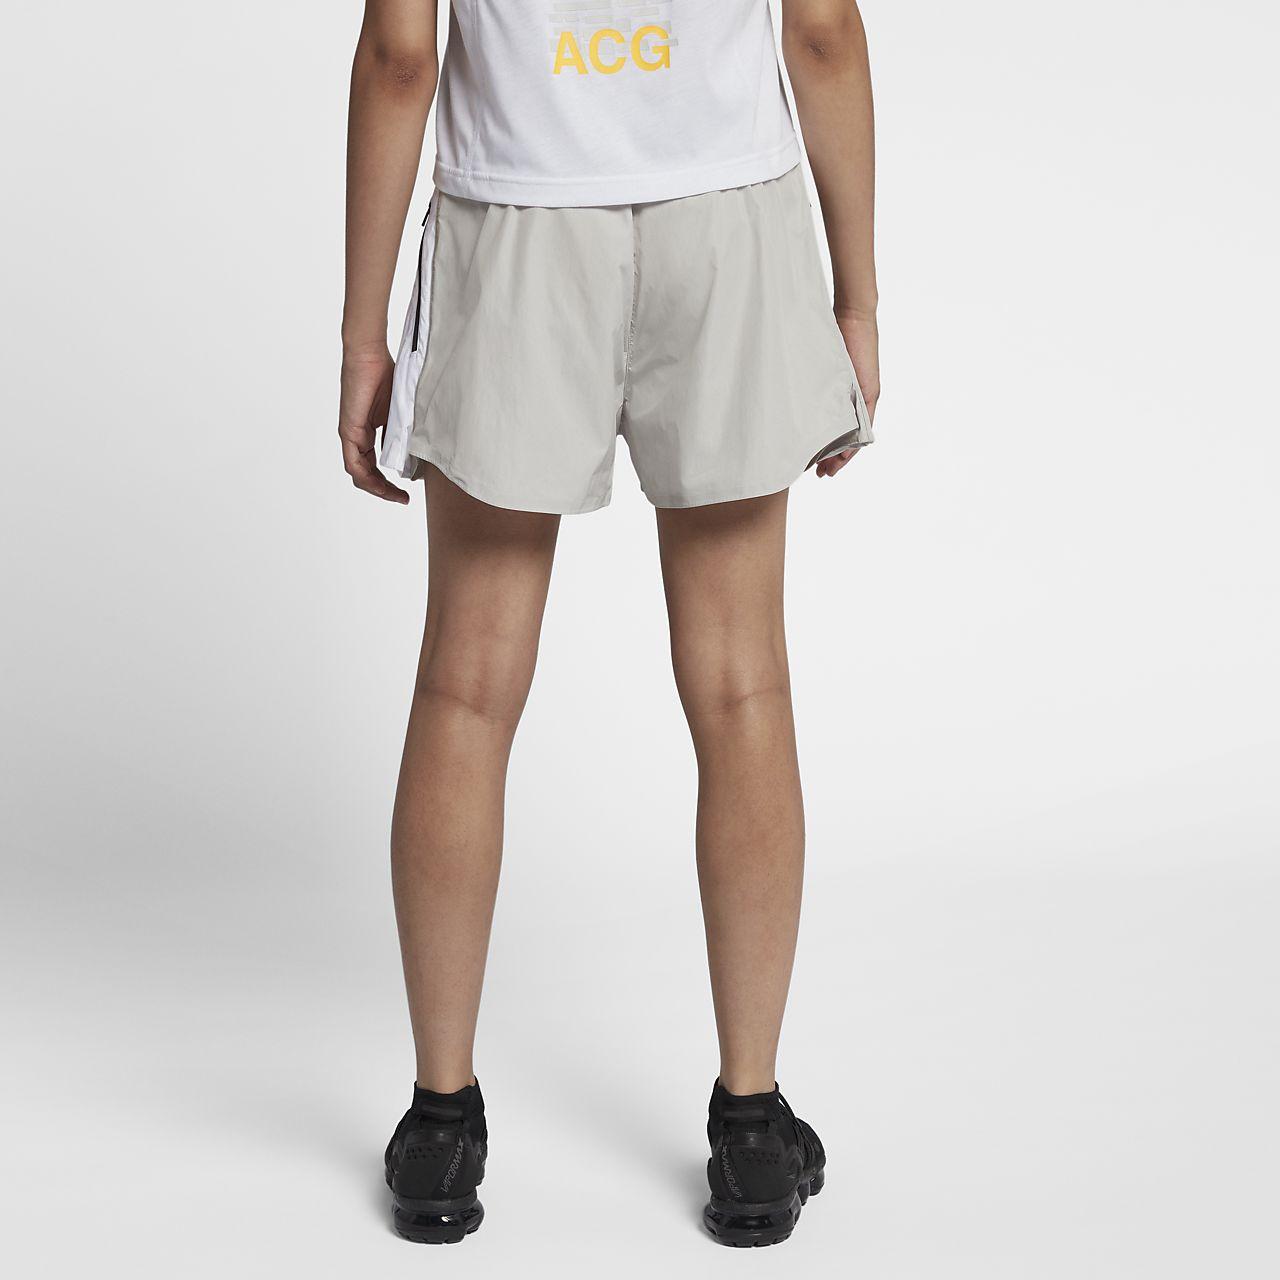 Nikelab Acg Con Mujer Bolsillos Corto Pantalón Es gU0qTg6